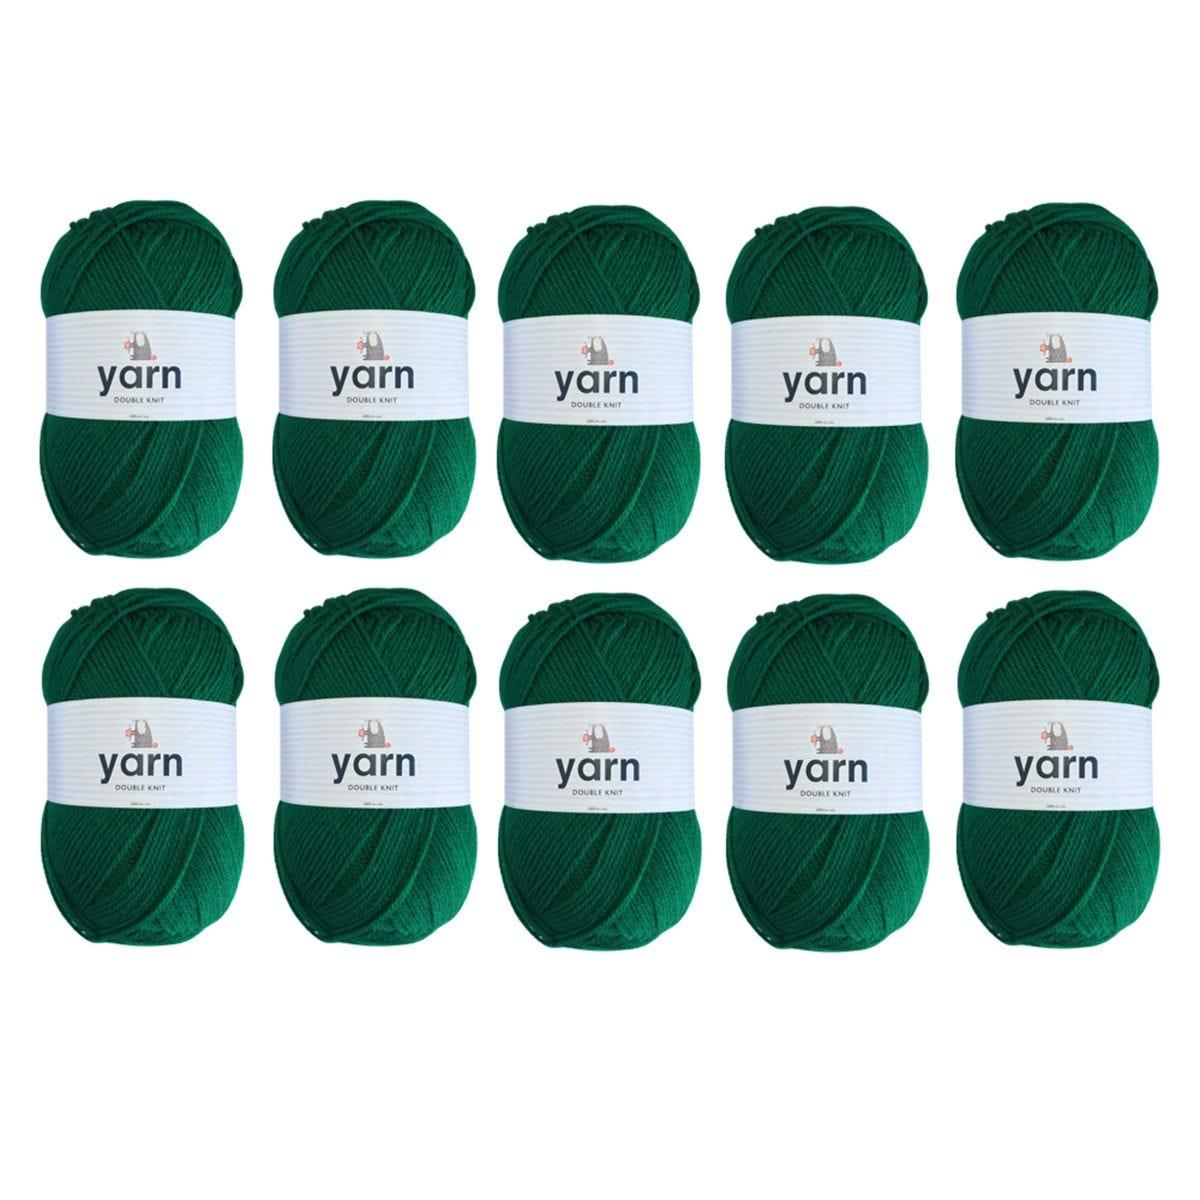 Korbond Emerald Double Knit Yarn Bulk Pack Bundle - 10 x 100g